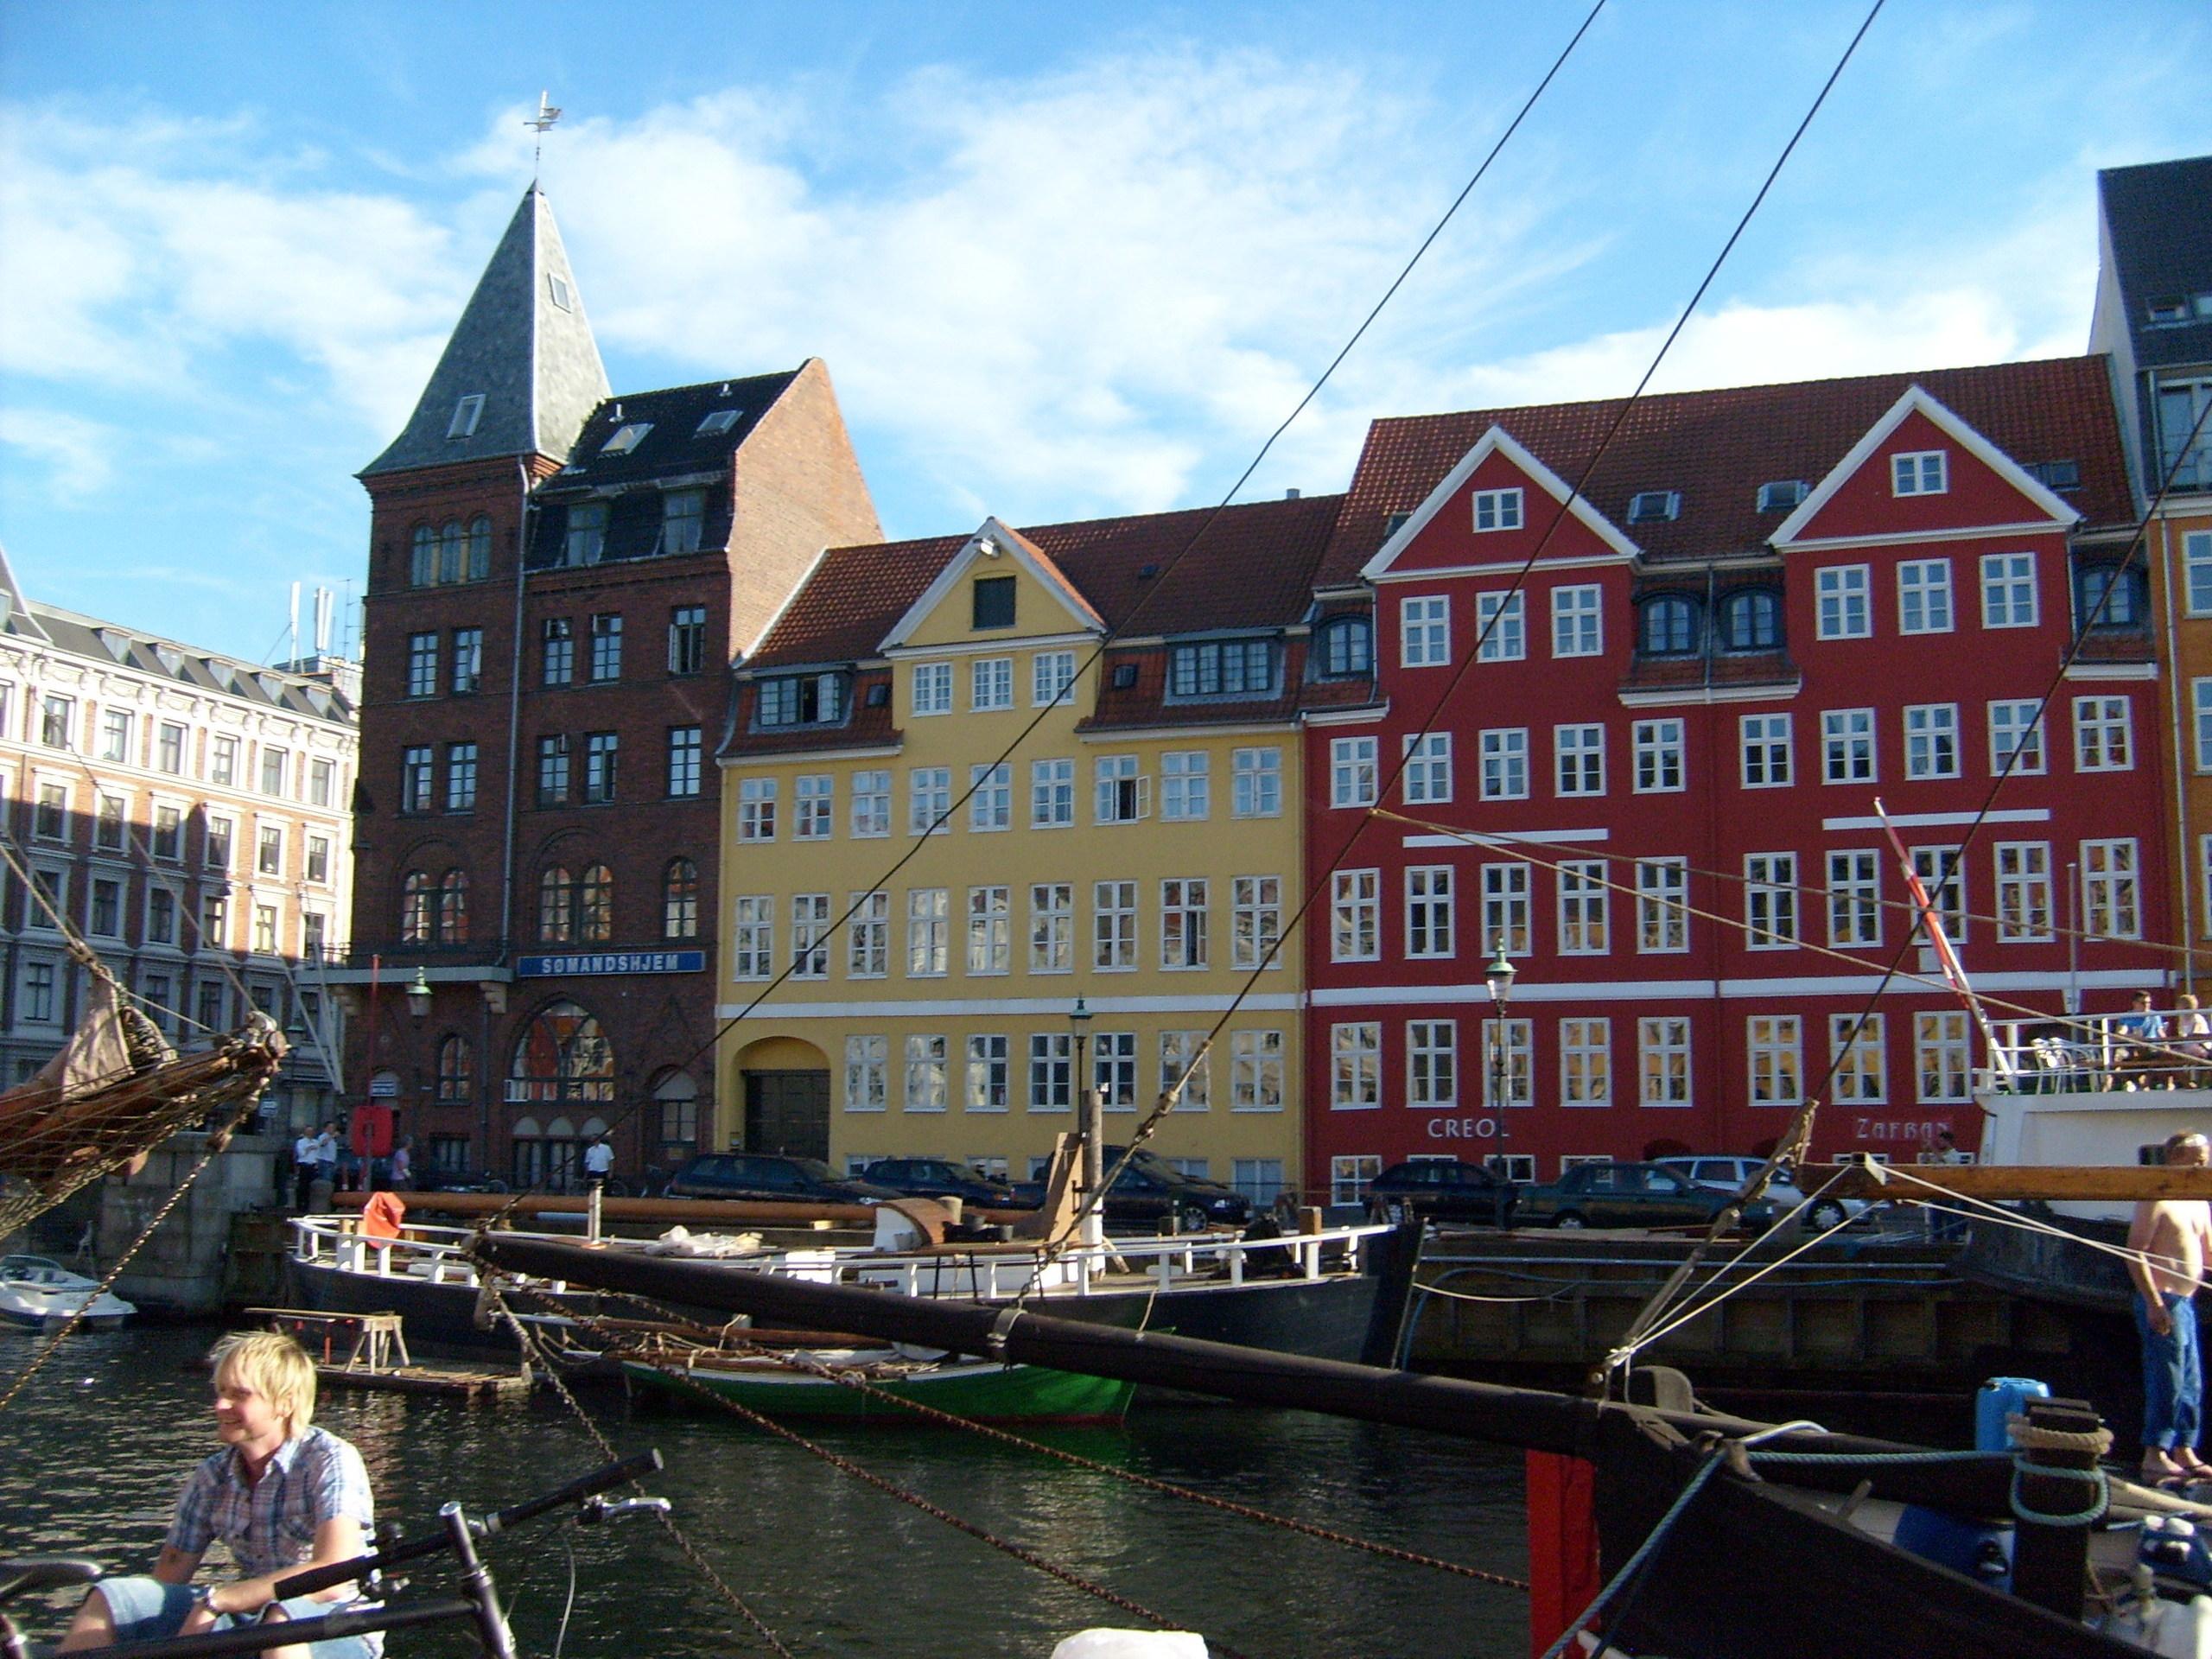 Scandinavia Images Copenhagen Denmark HD Wallpaper And Background Photos